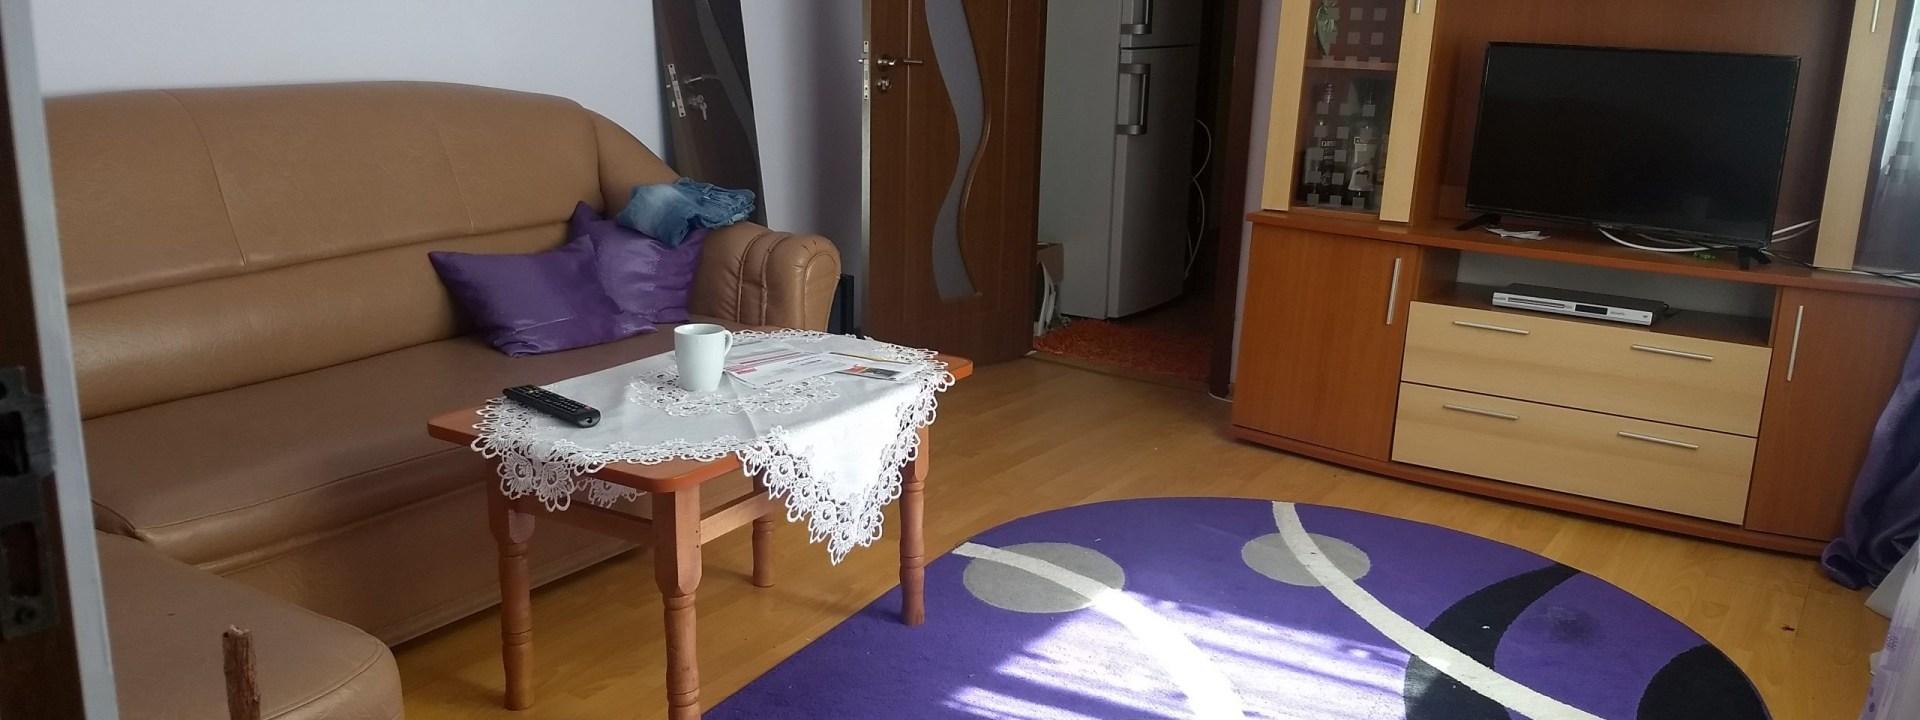 Apartament de Inchiriat cu 2 Camere Semidecomandate in Zona Marasesti